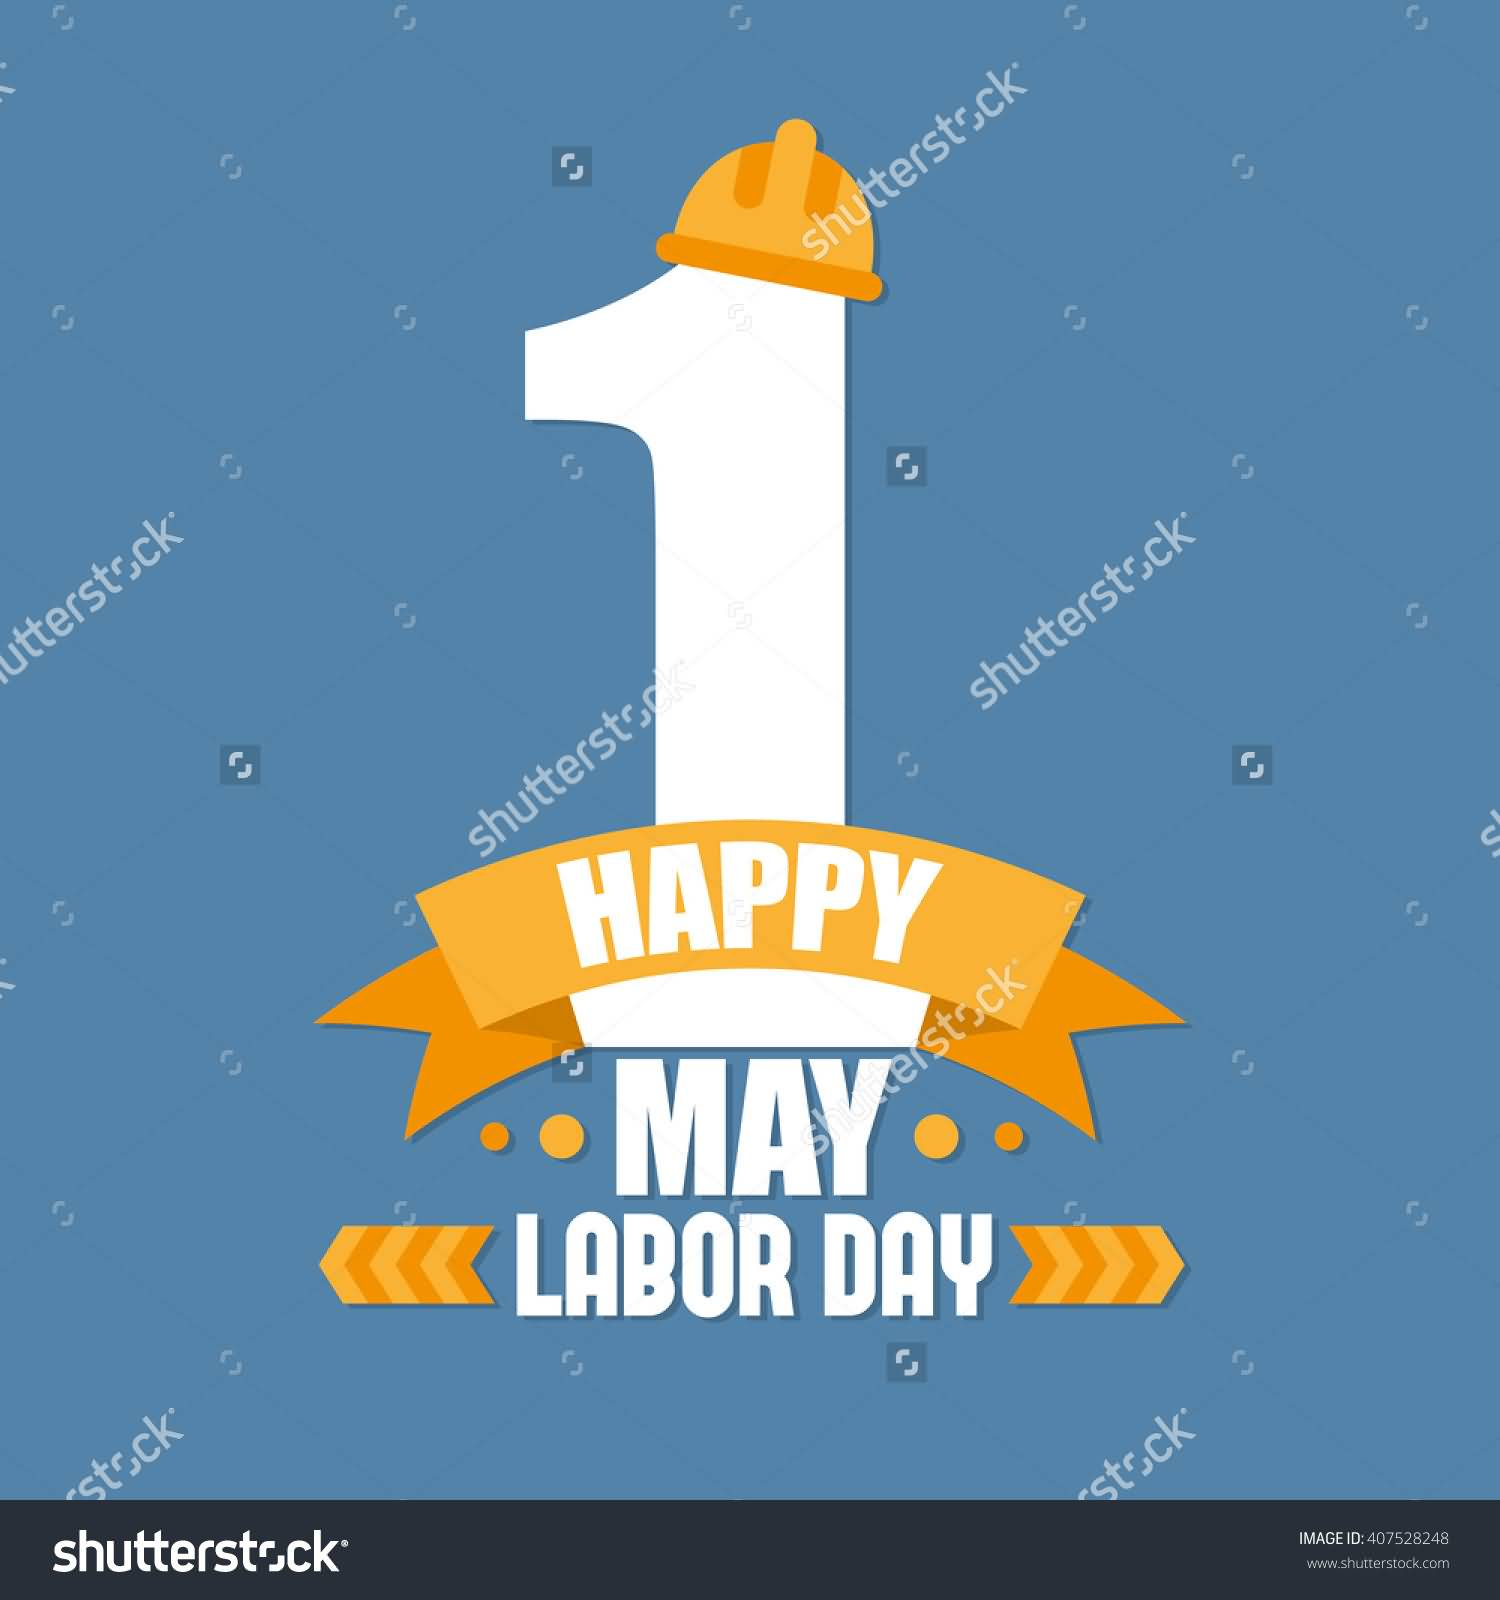 1 May Happy Labor Day Illustration